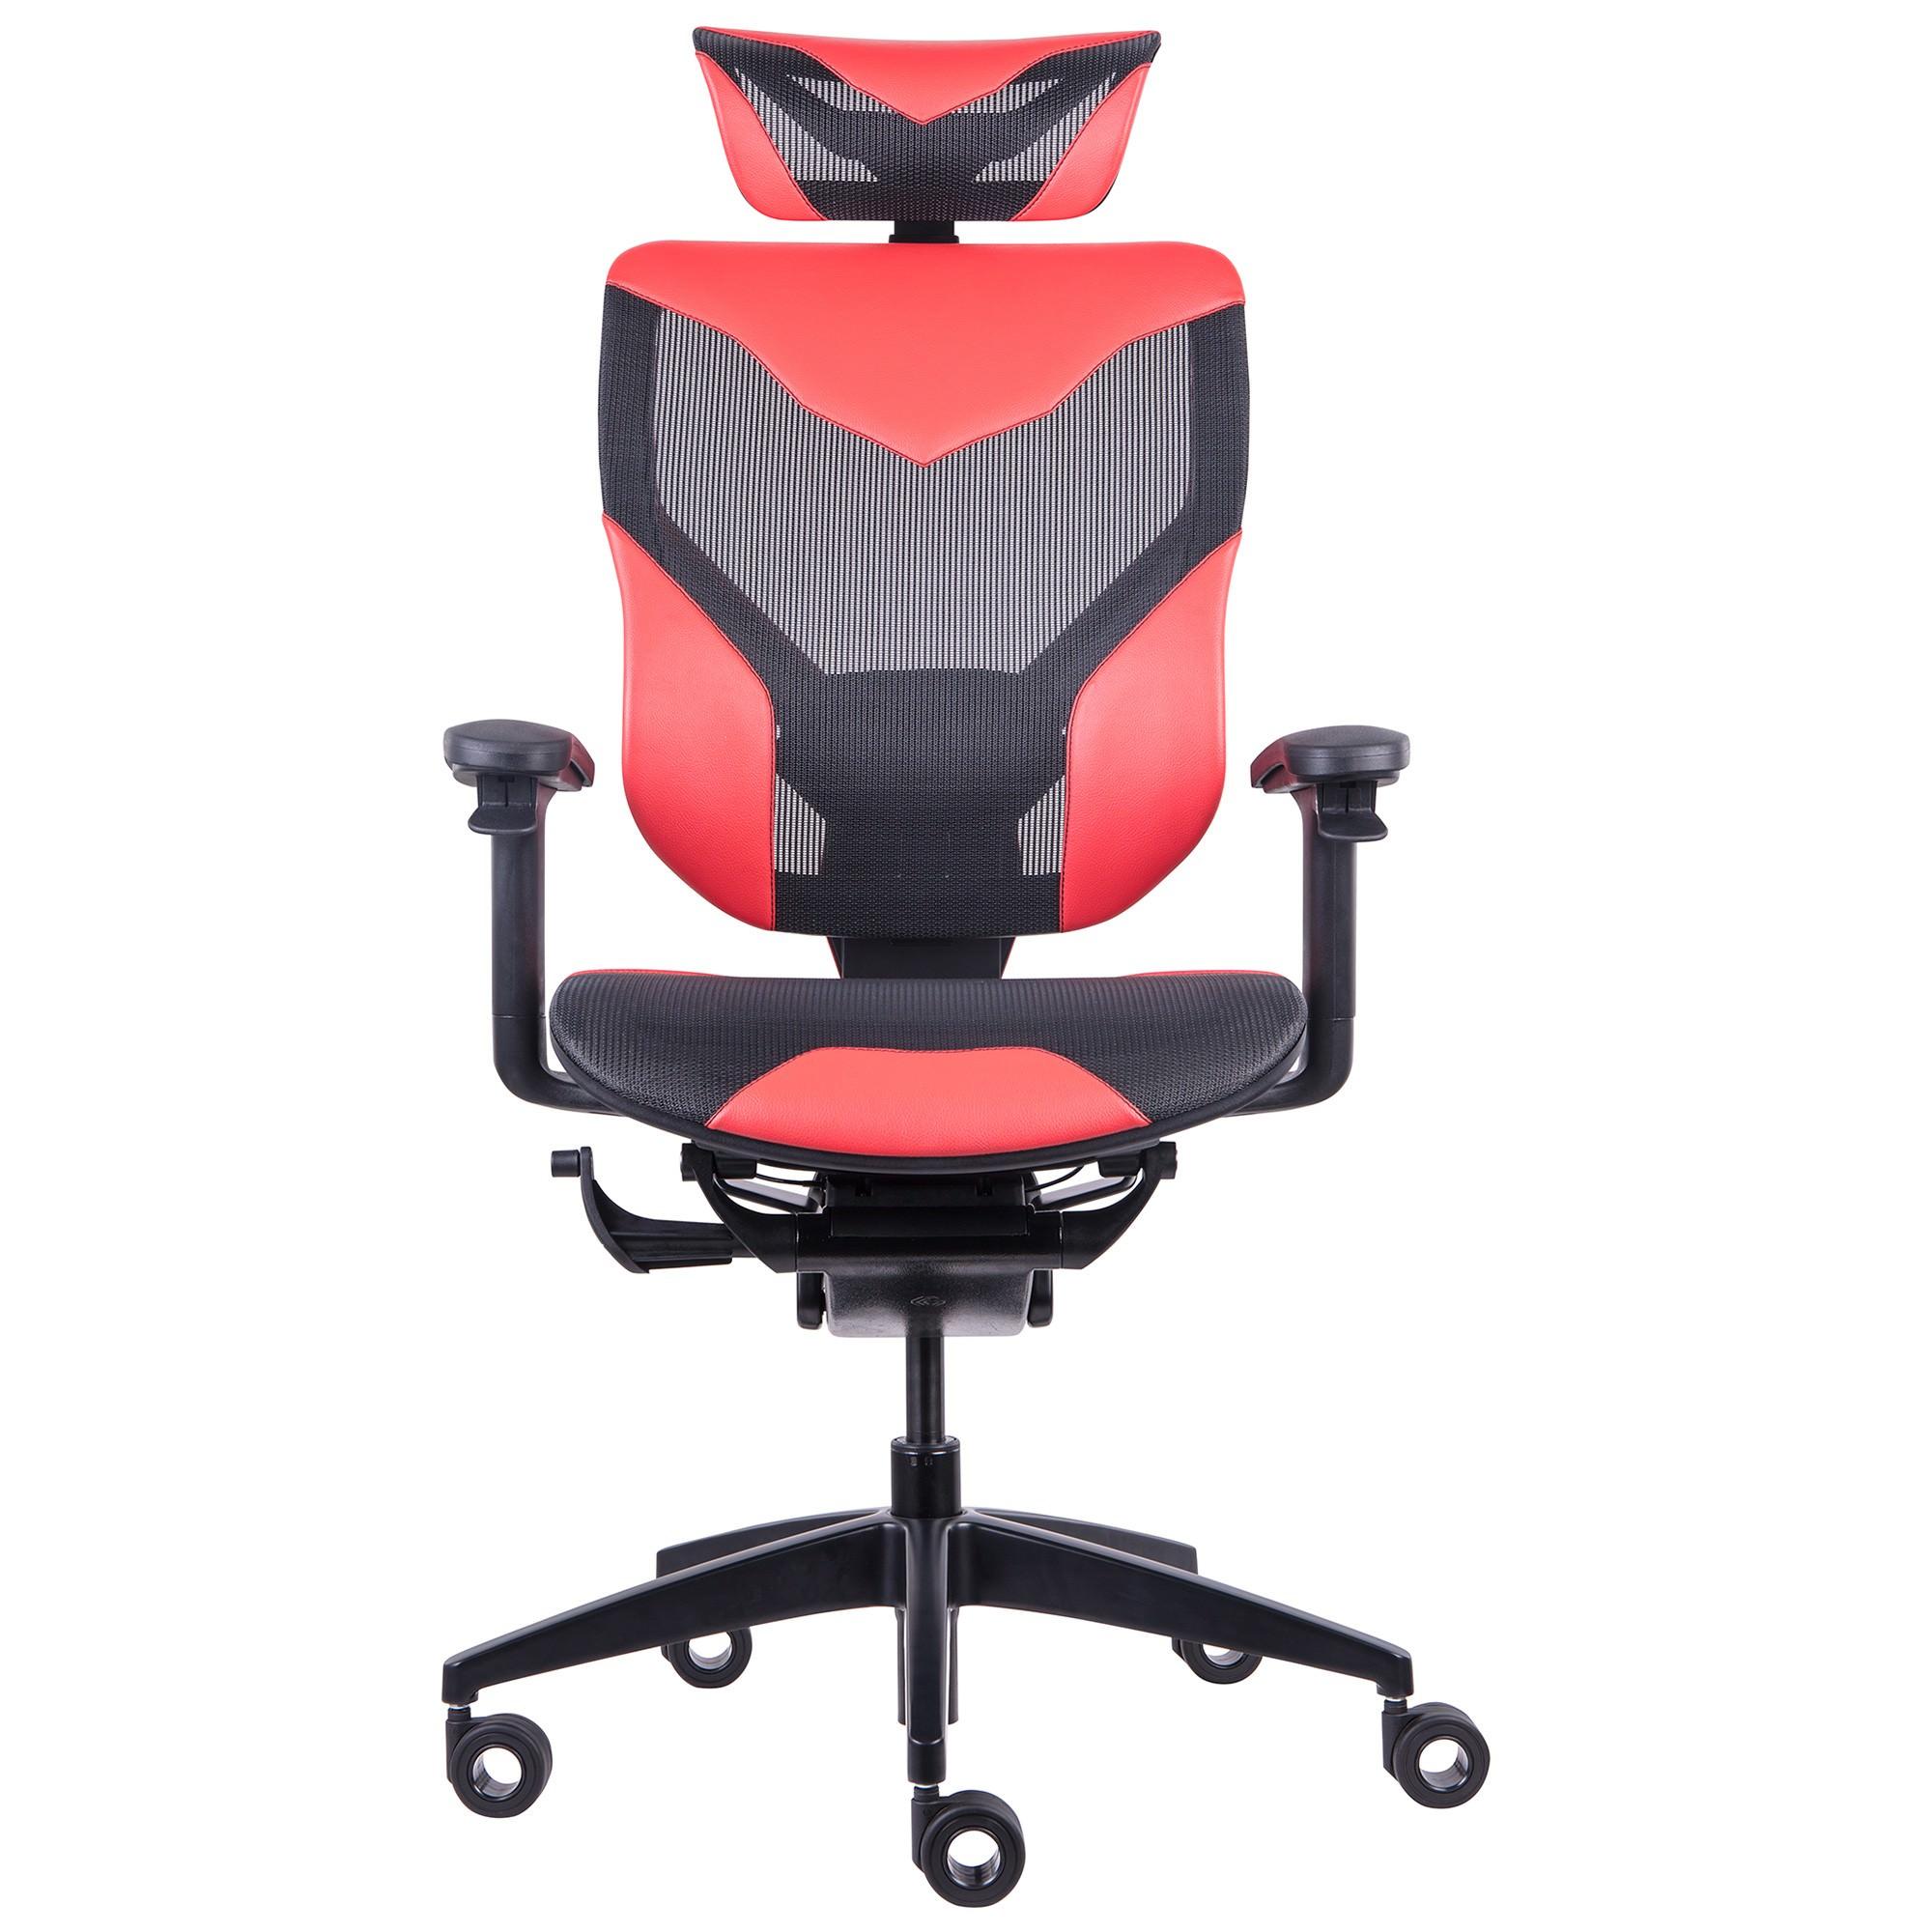 GTCHAIR GR-V7-X Vida Ergonomic Gaming / Office Chair, Red